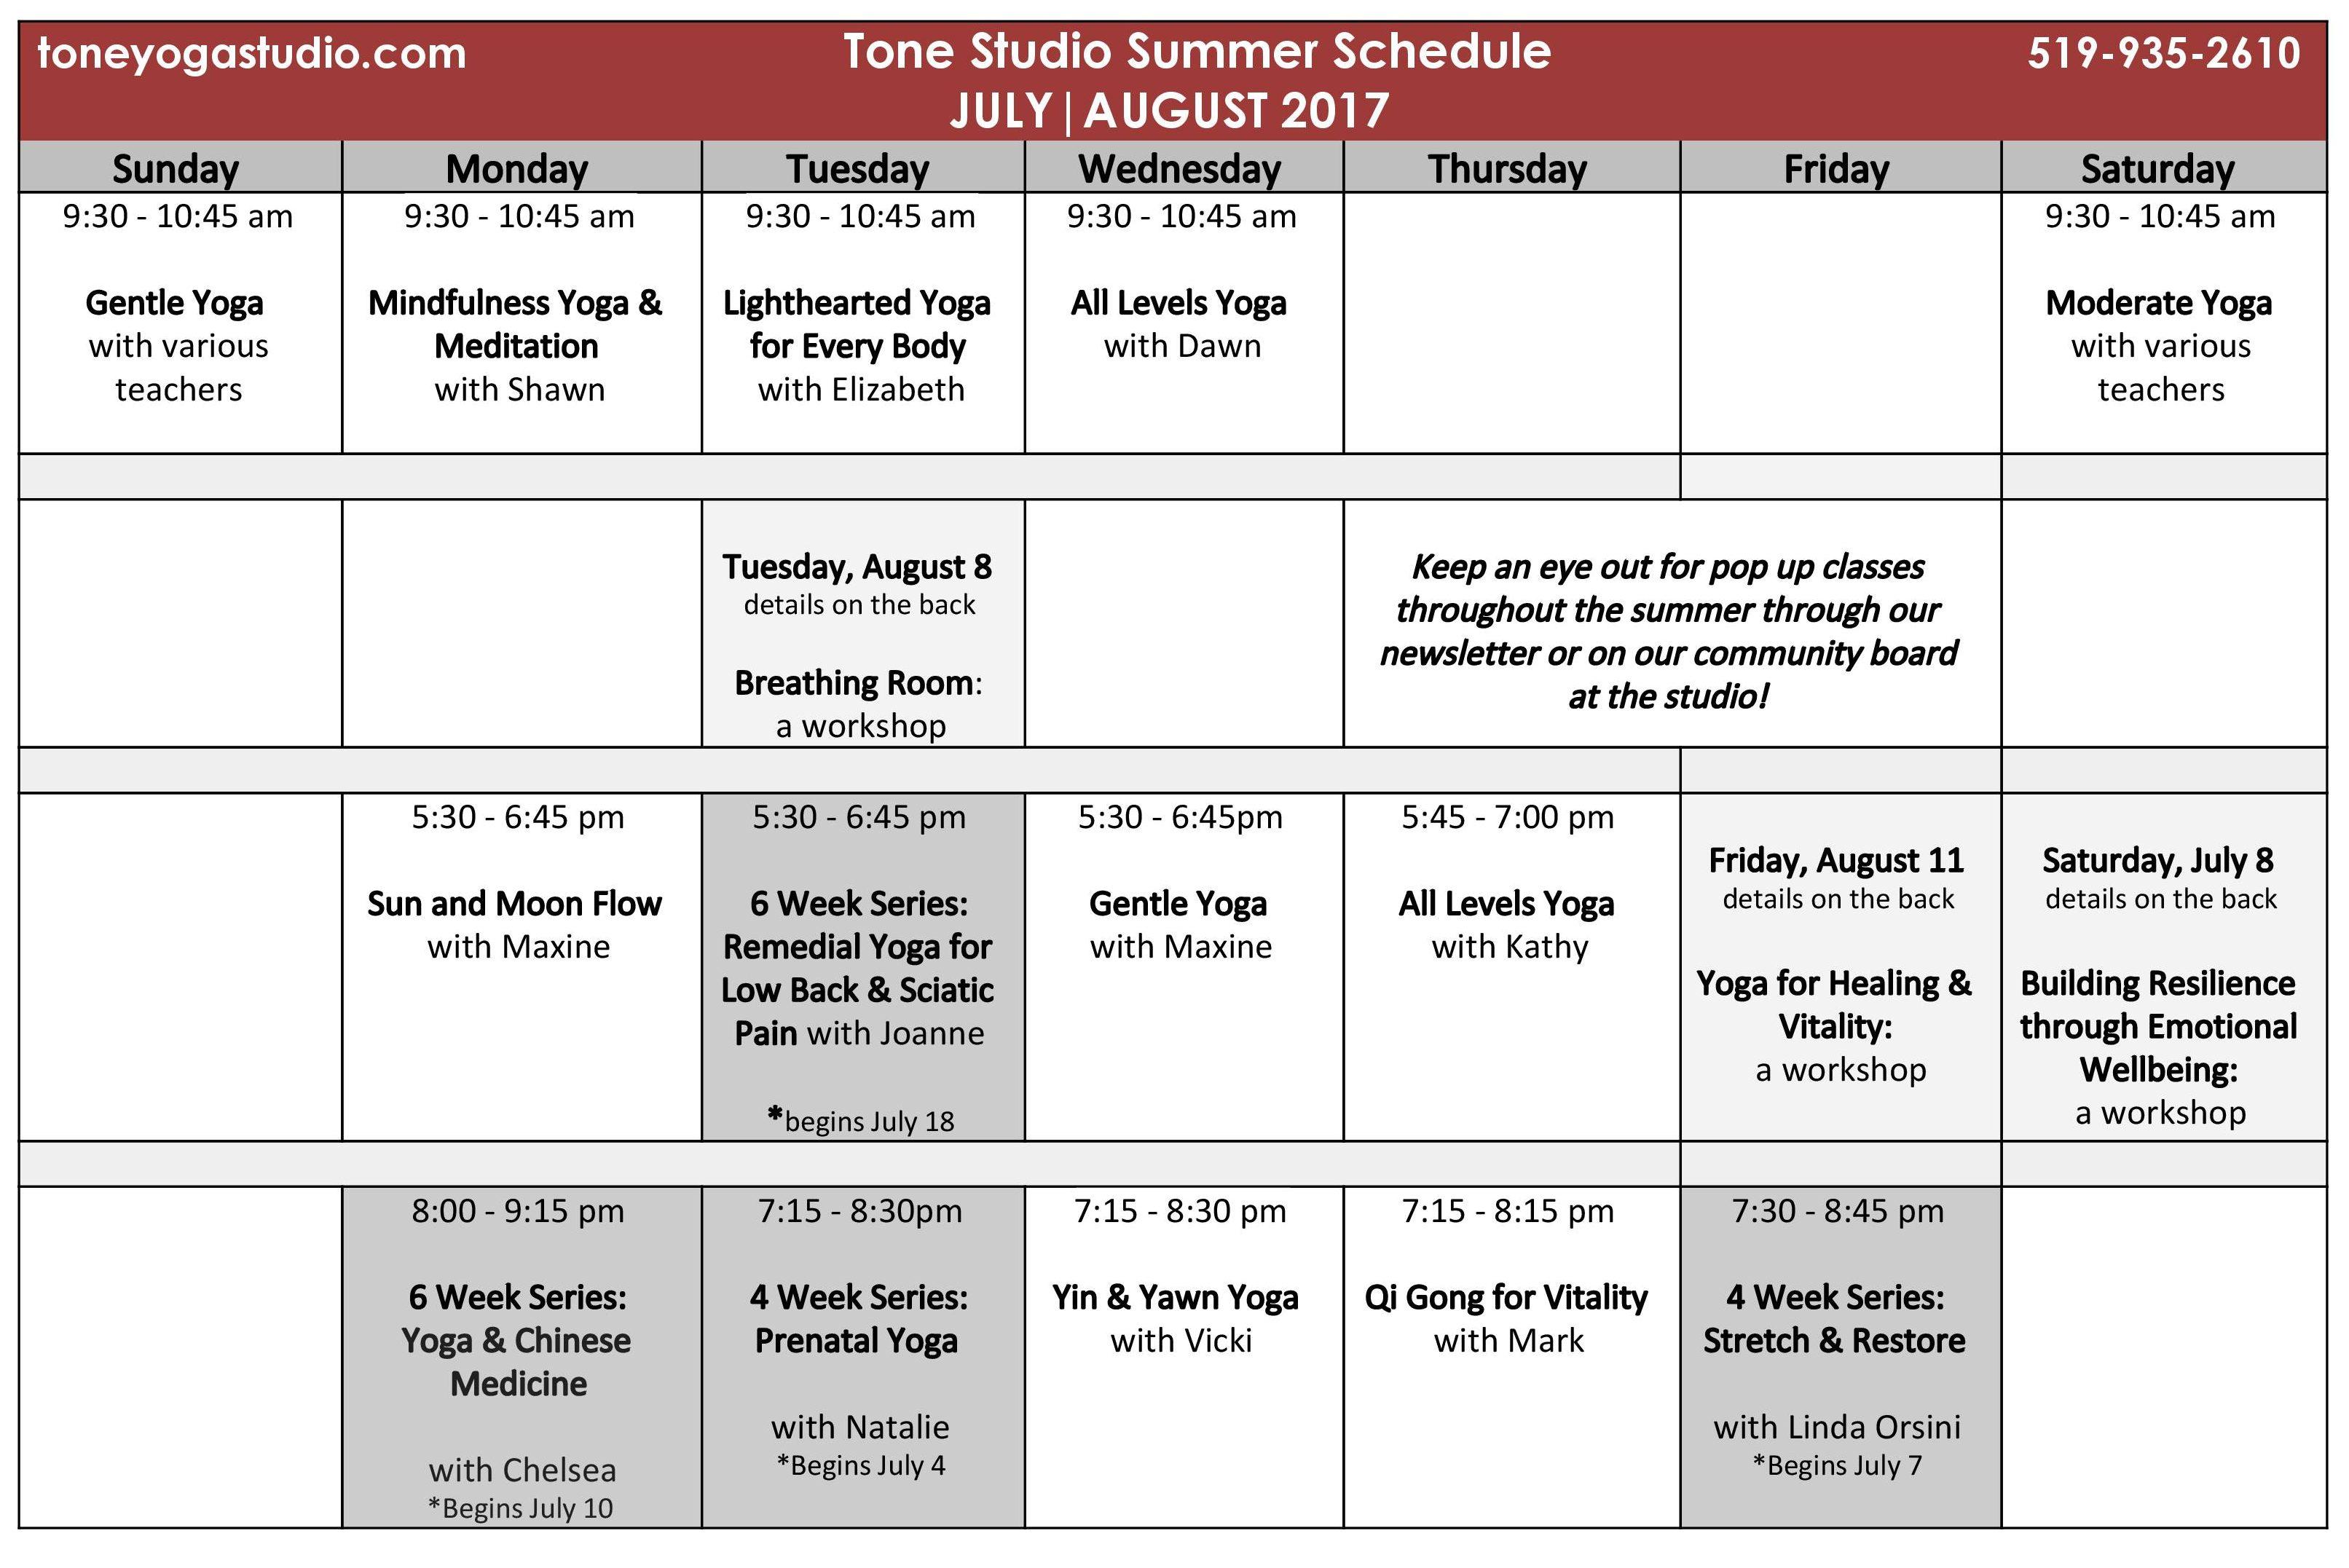 JULY & AUGUST Weekly Summer Schedule